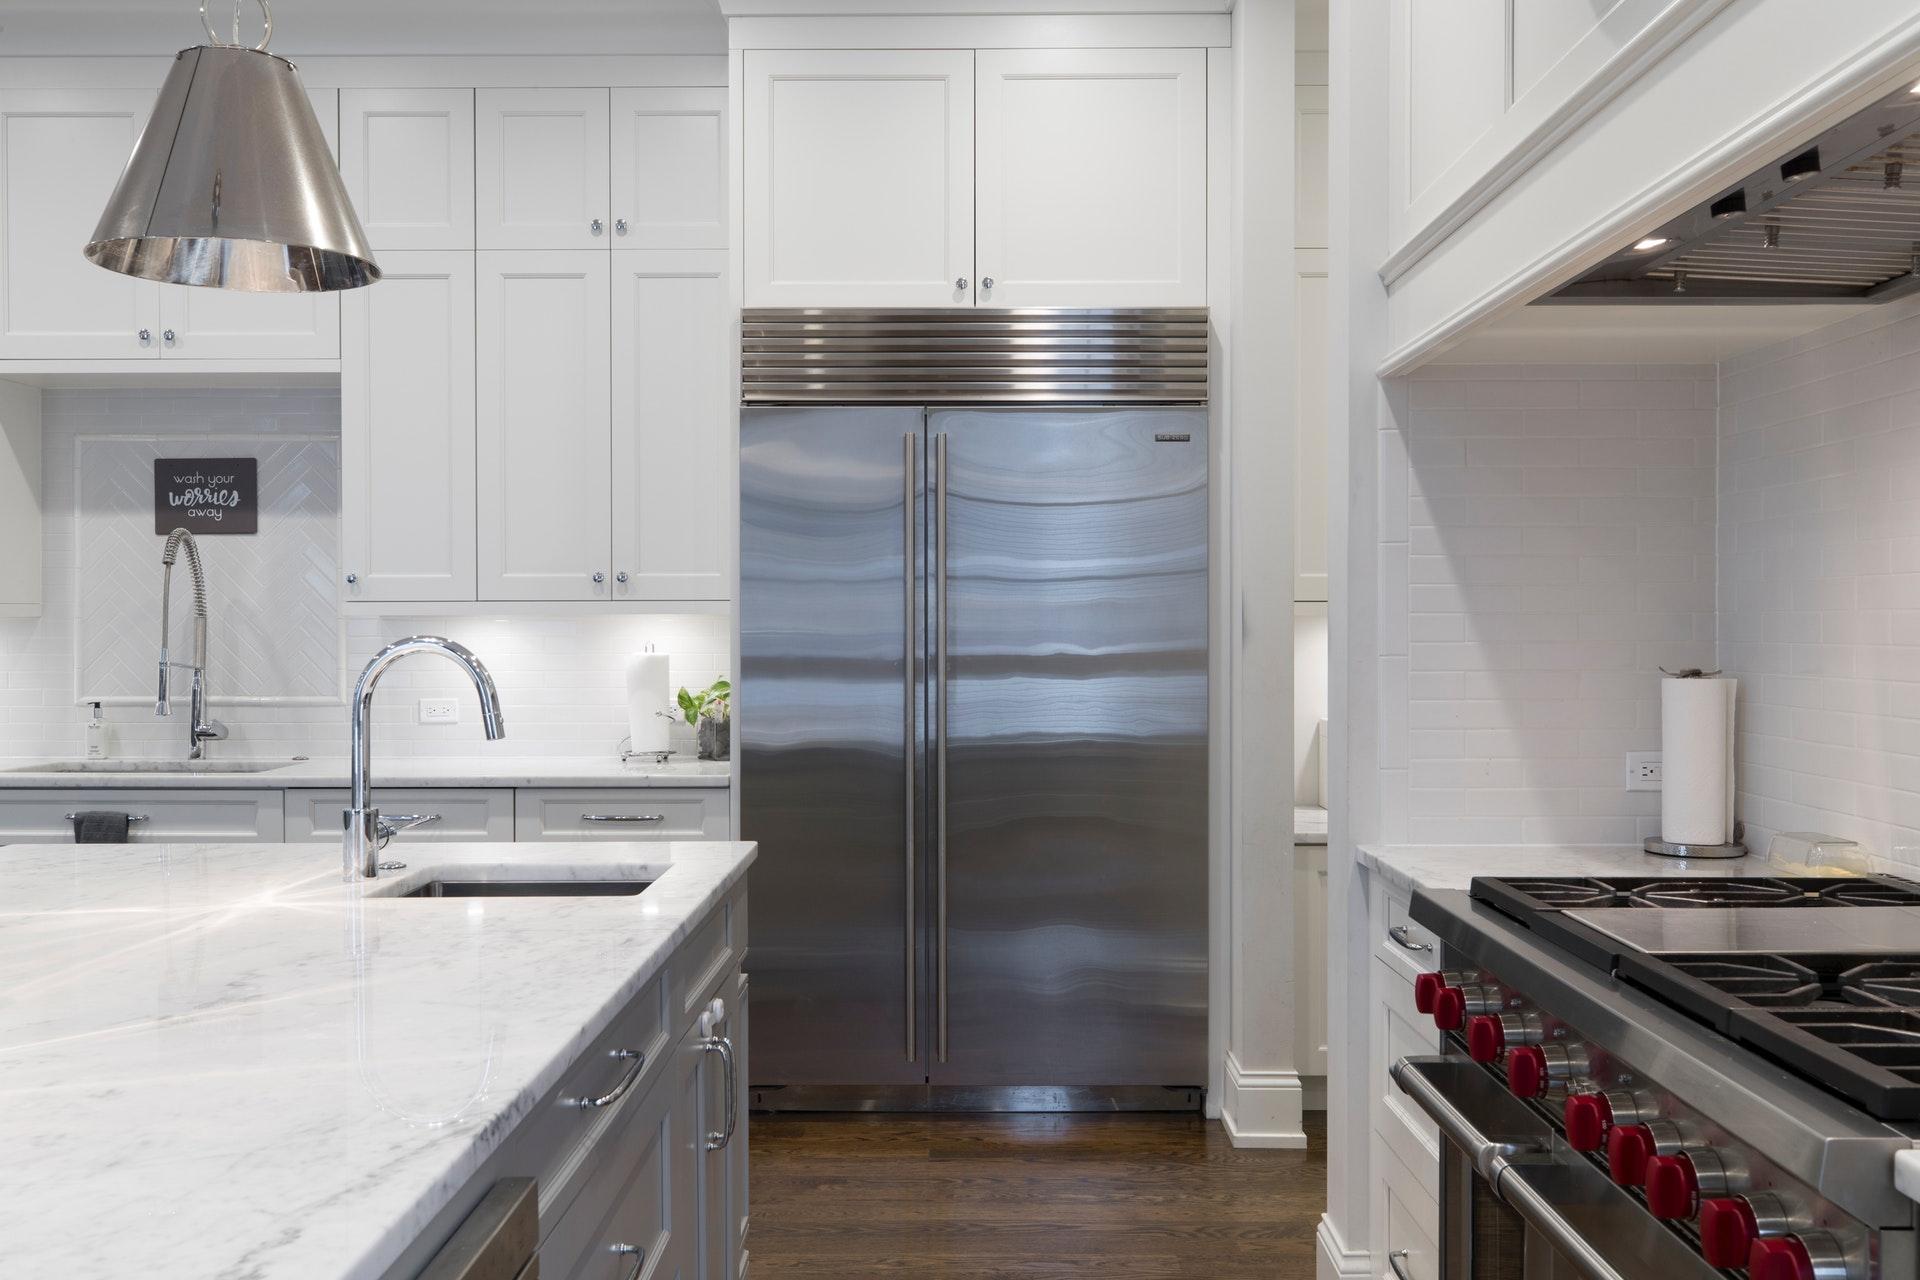 2020 Luxury Kitchens